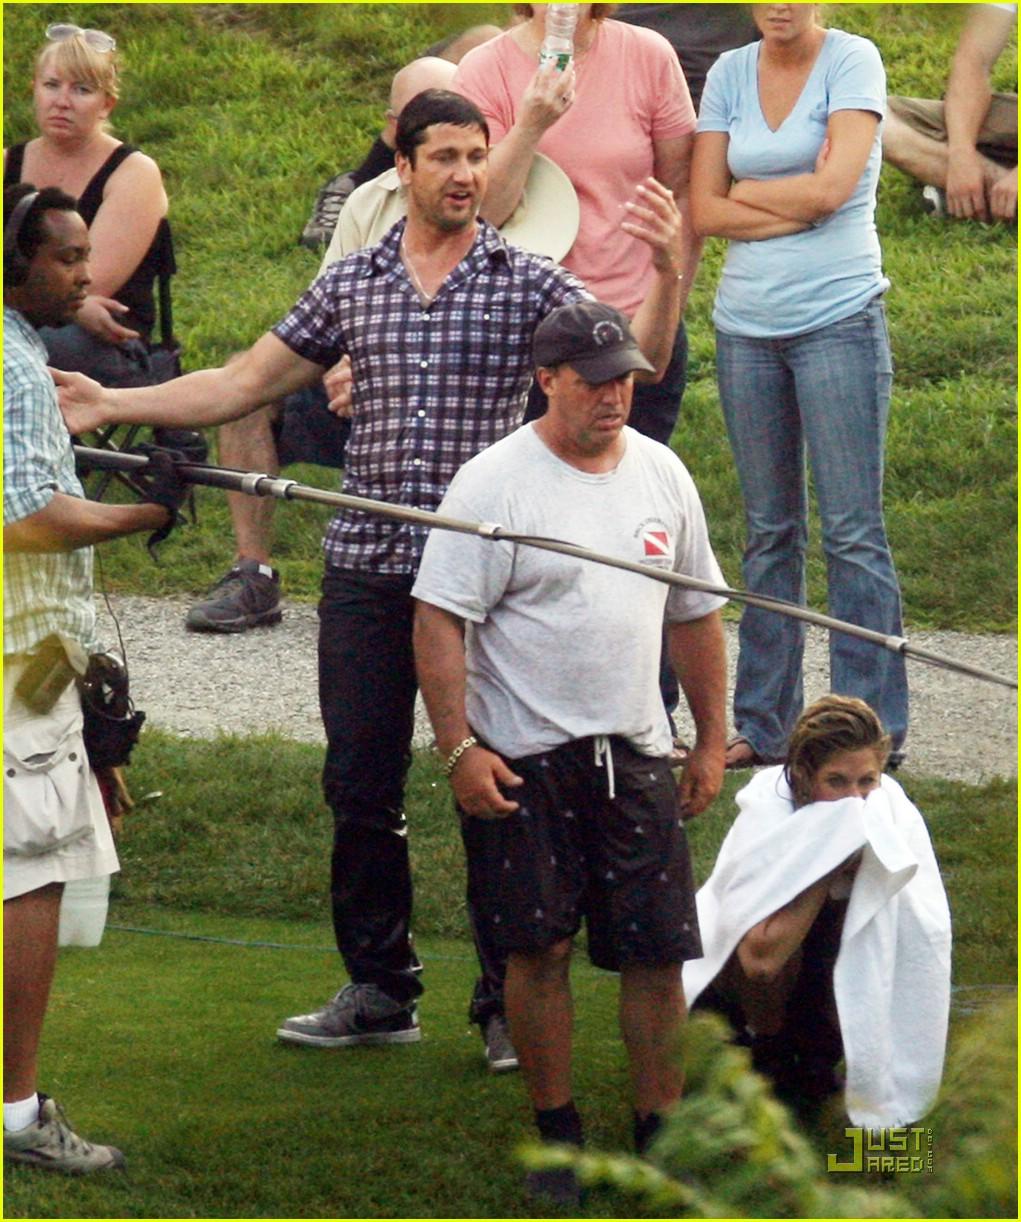 Gerard Butler & Jennifer Aniston: Soaking Wet! Gerard Butler